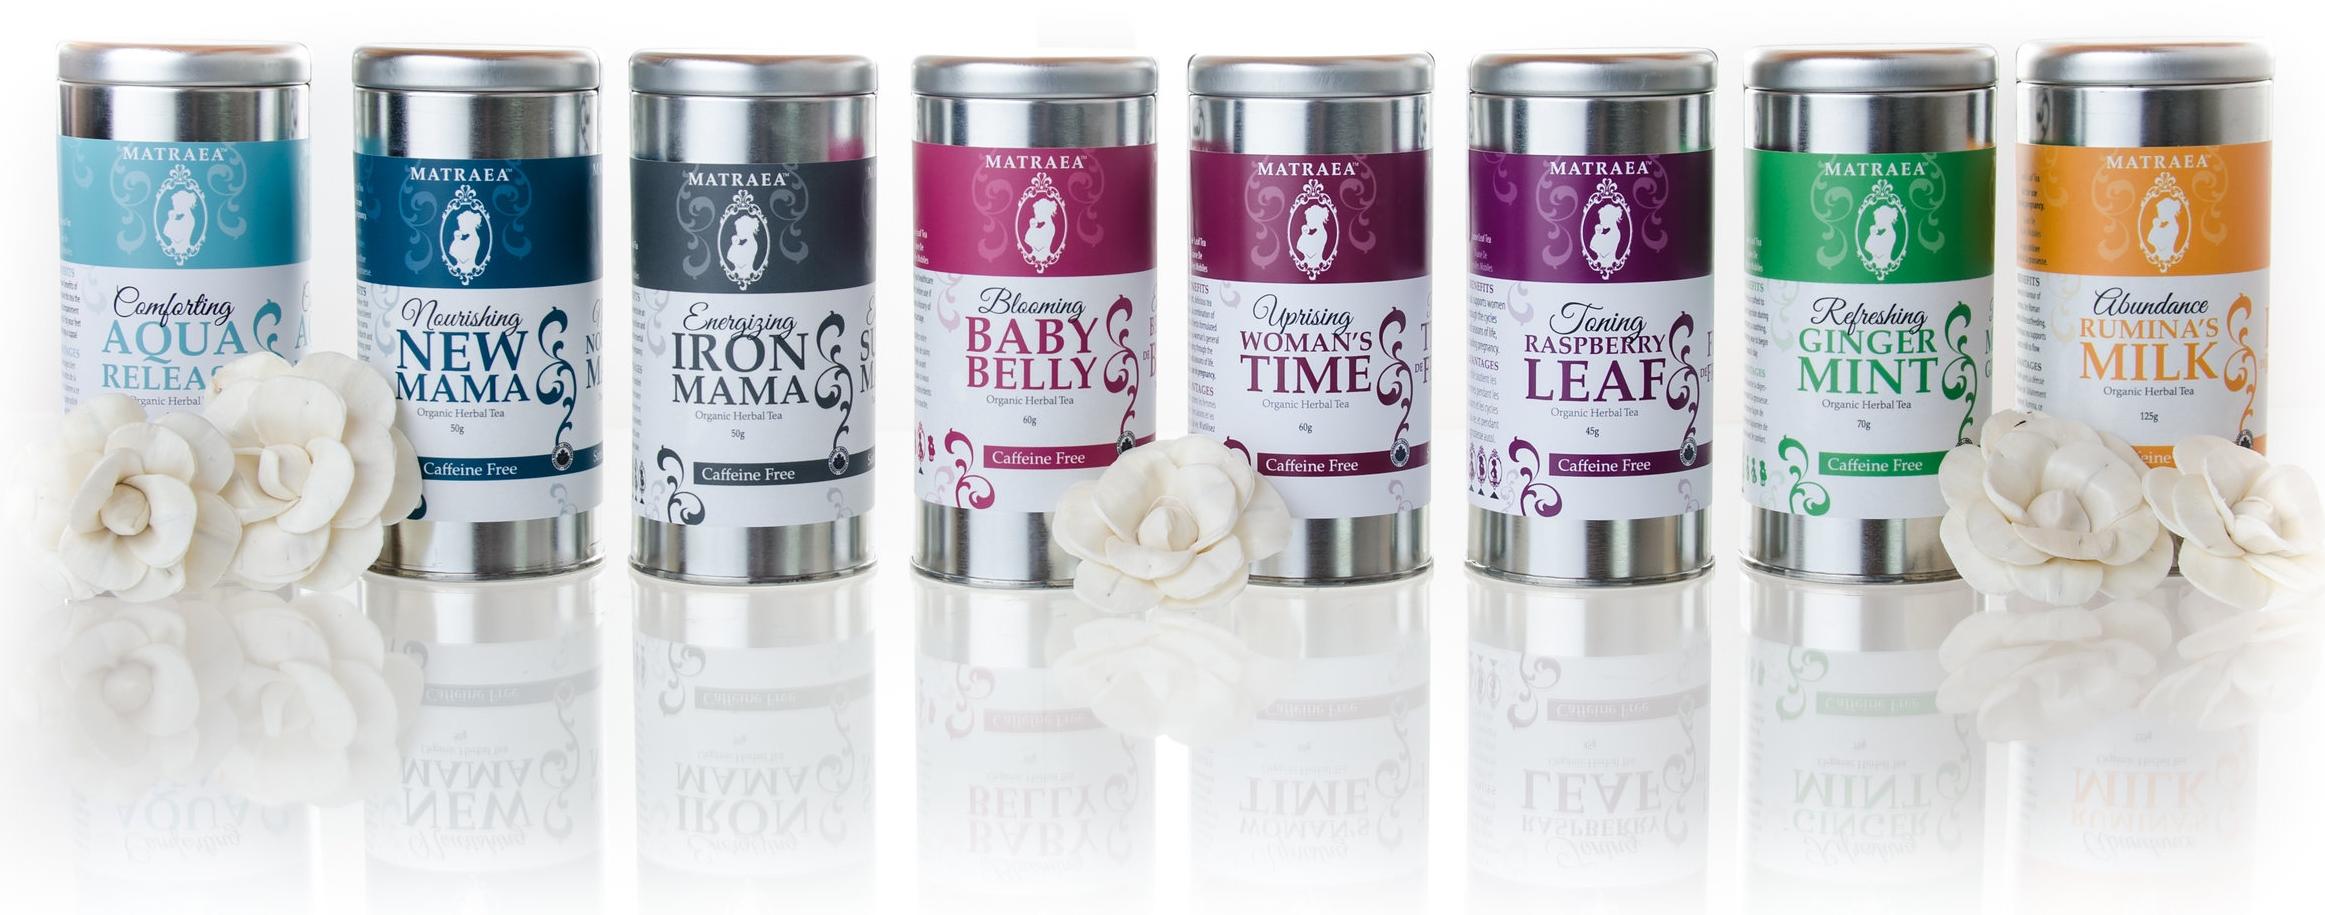 matraea+tea+organic+pregnancy+herbal.jpg